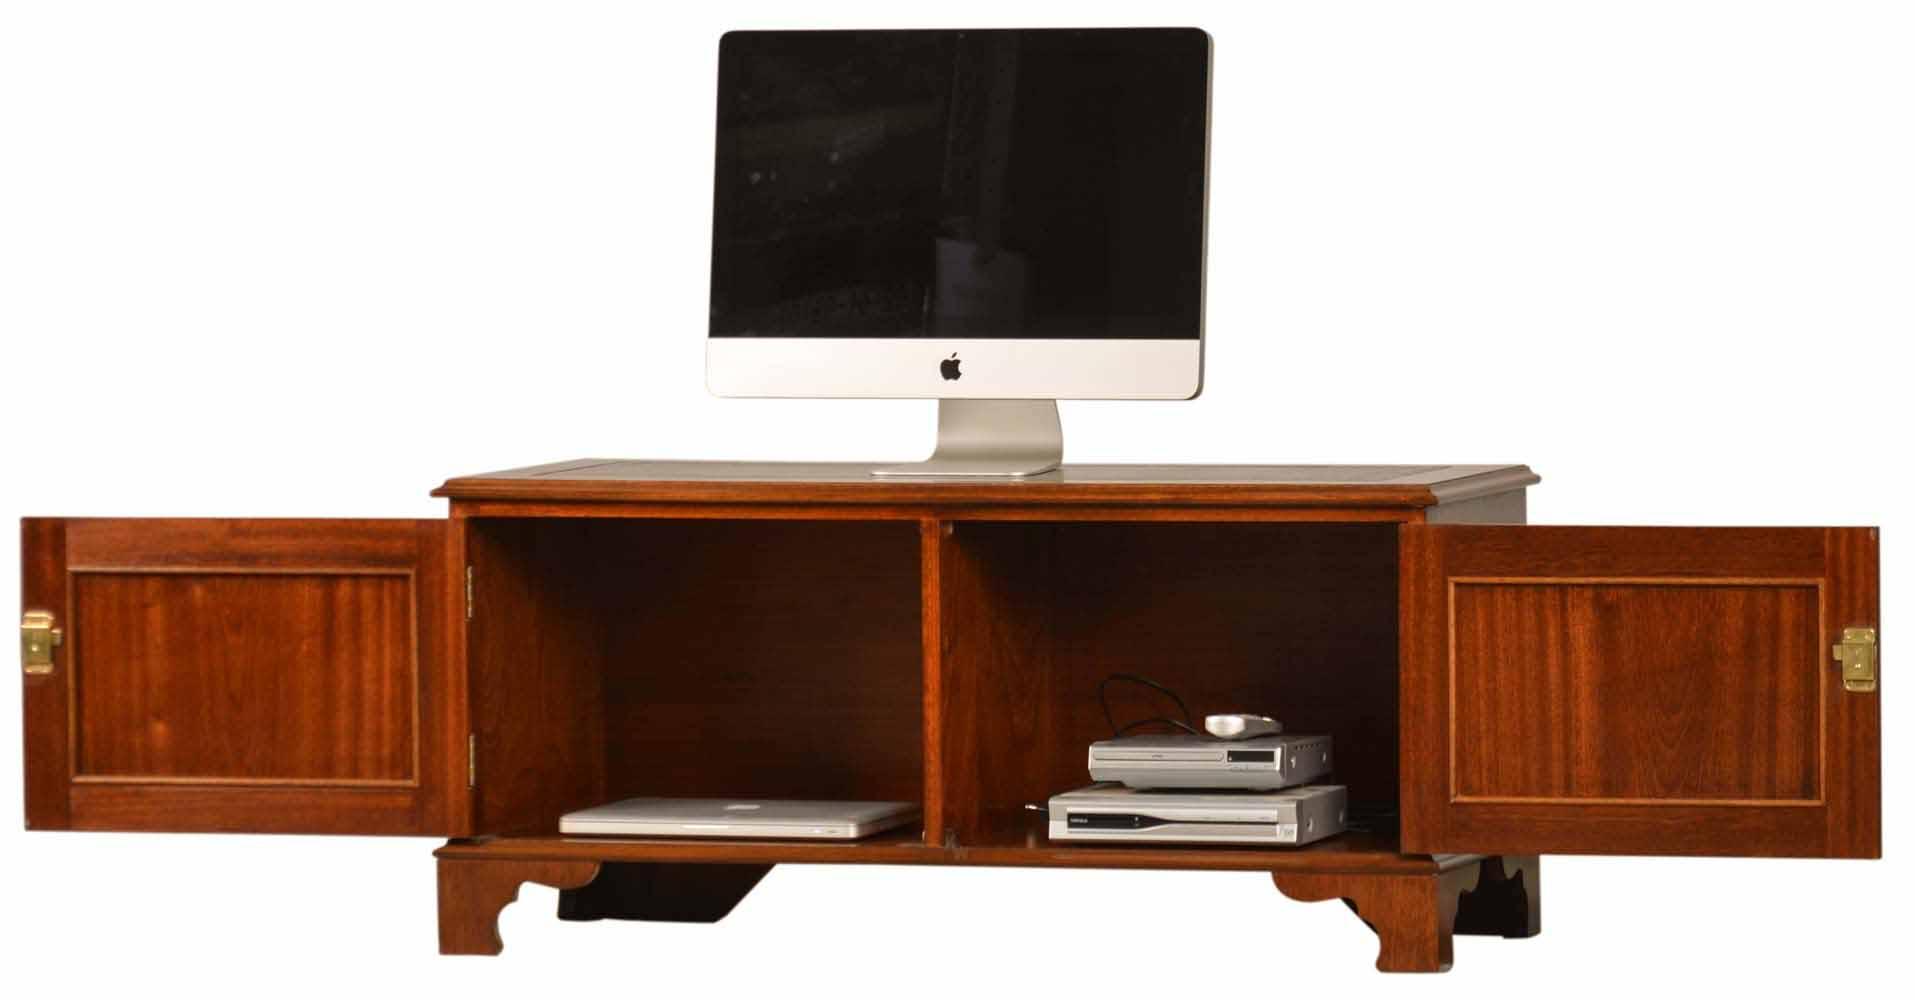 lowboard mahagoni englische m bel von kai. Black Bedroom Furniture Sets. Home Design Ideas